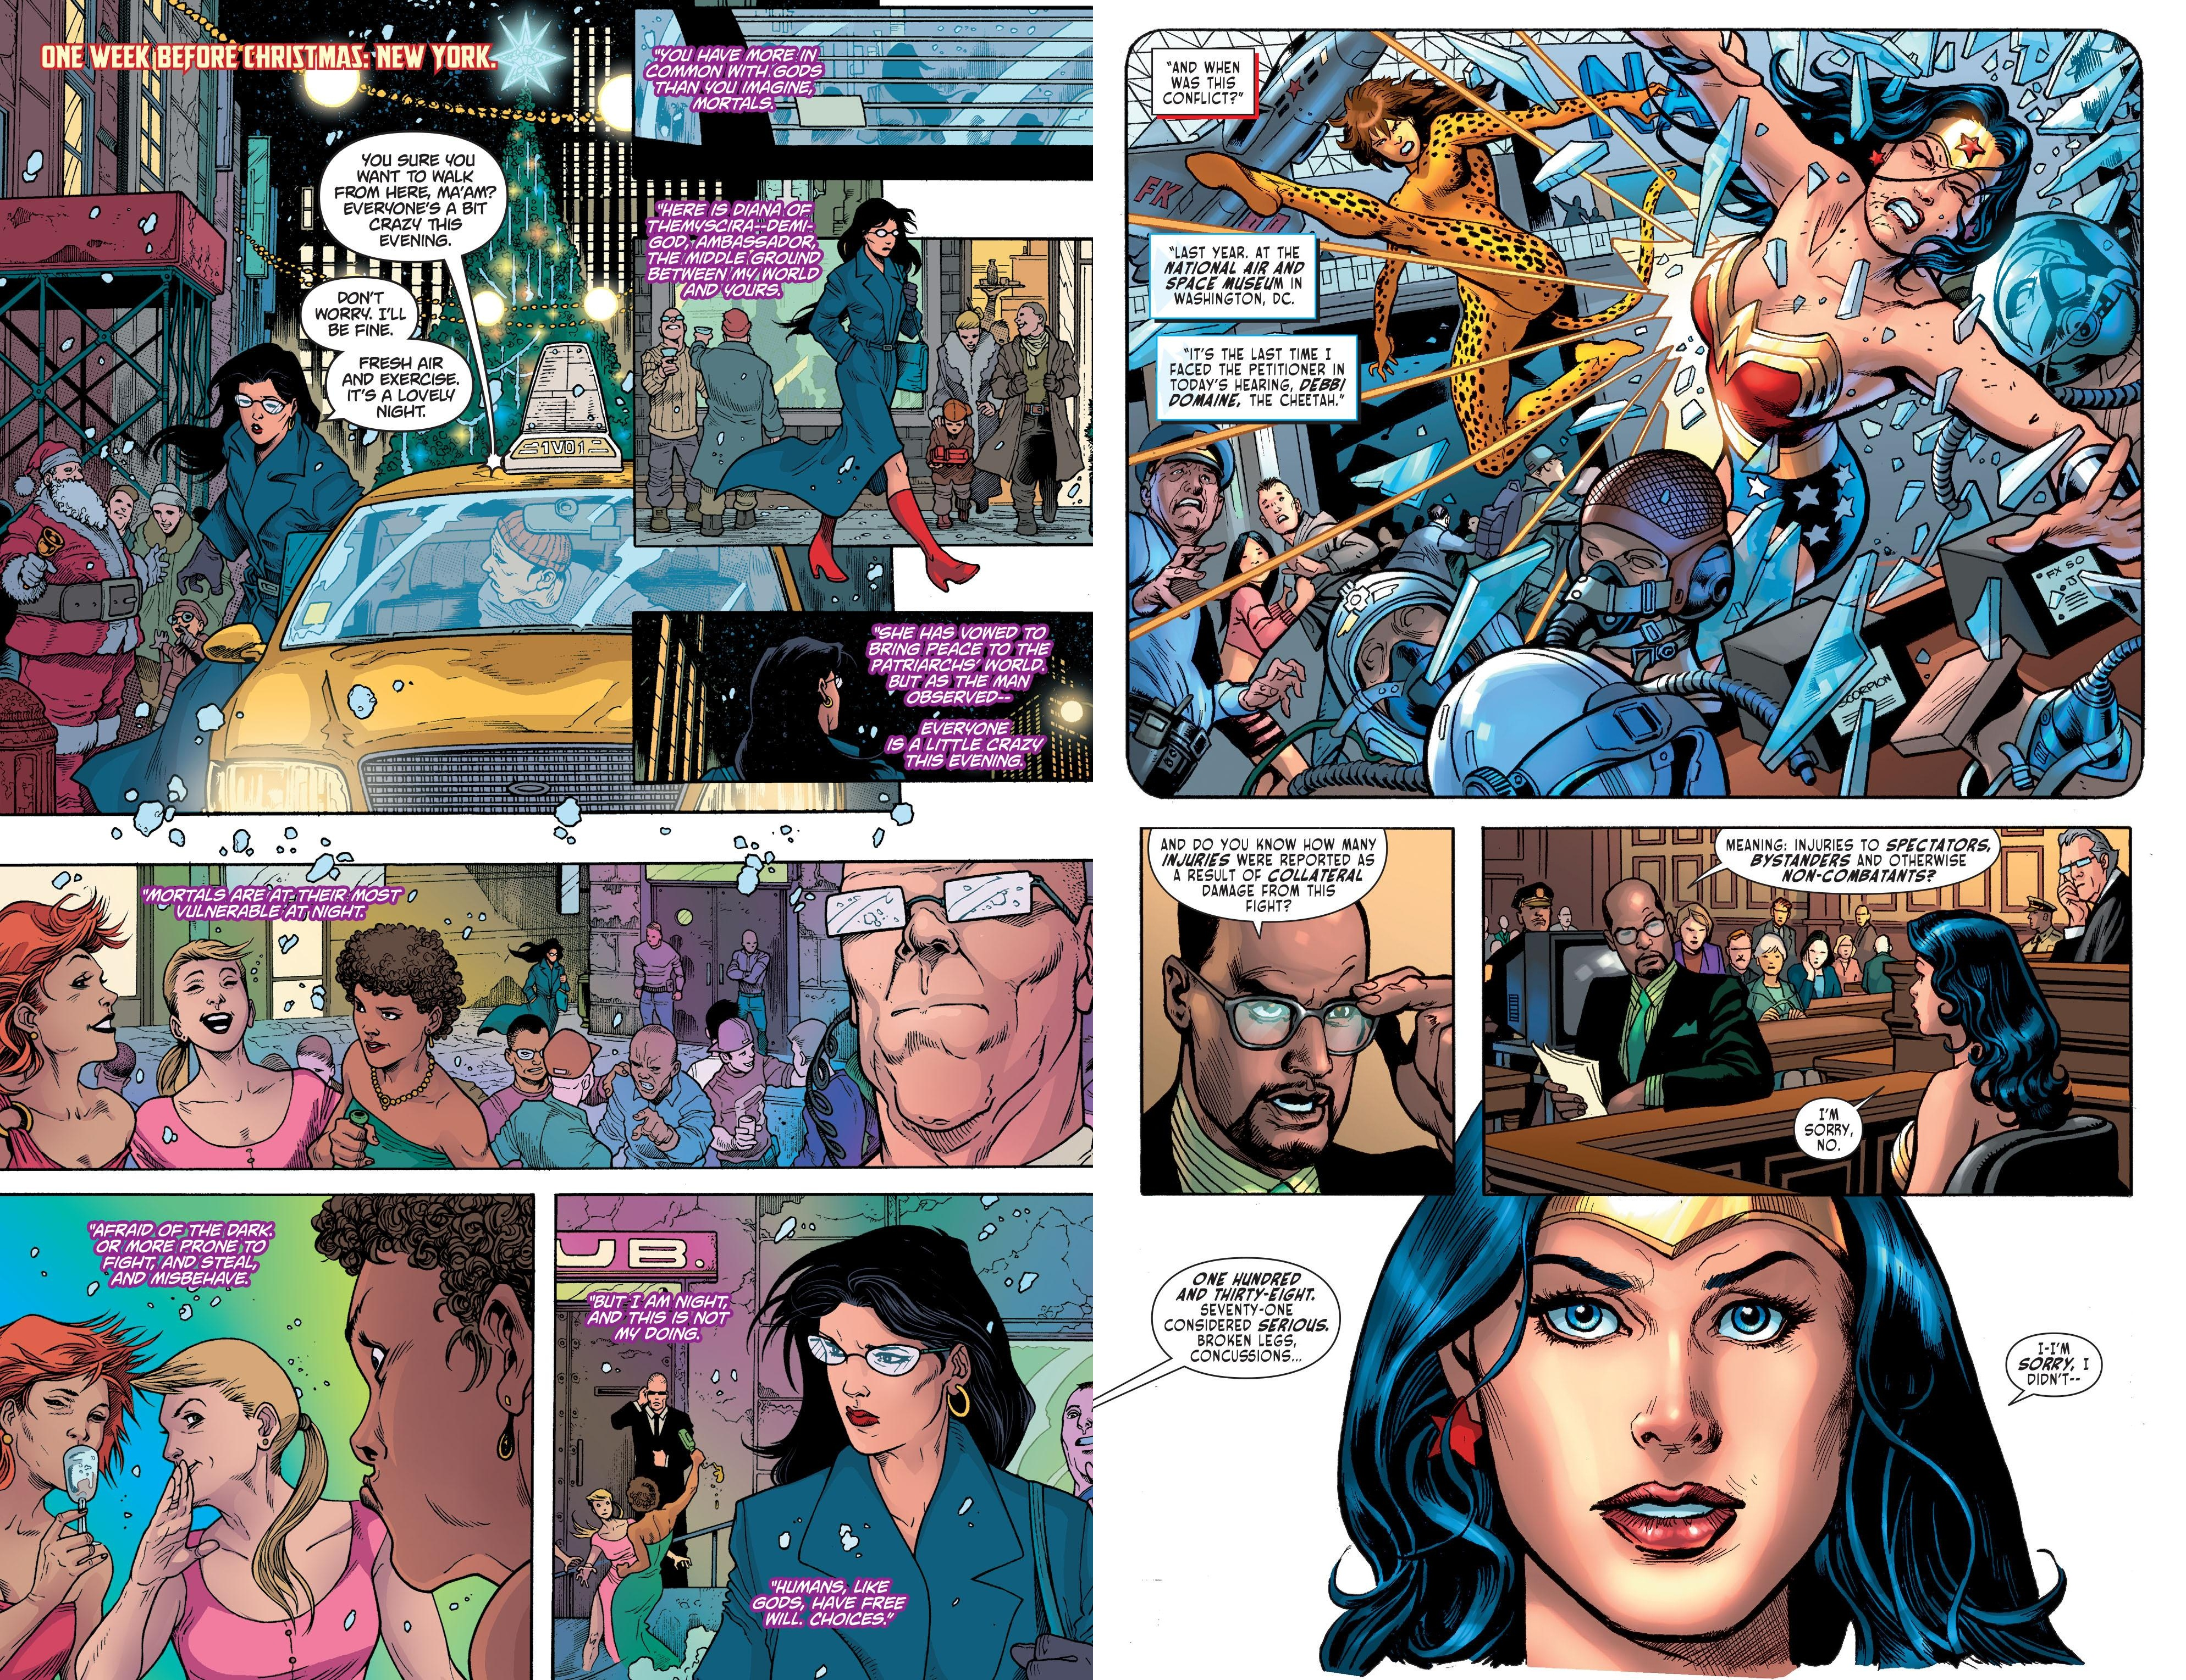 Sensation Comics Featuring Wonder Woman V3 review